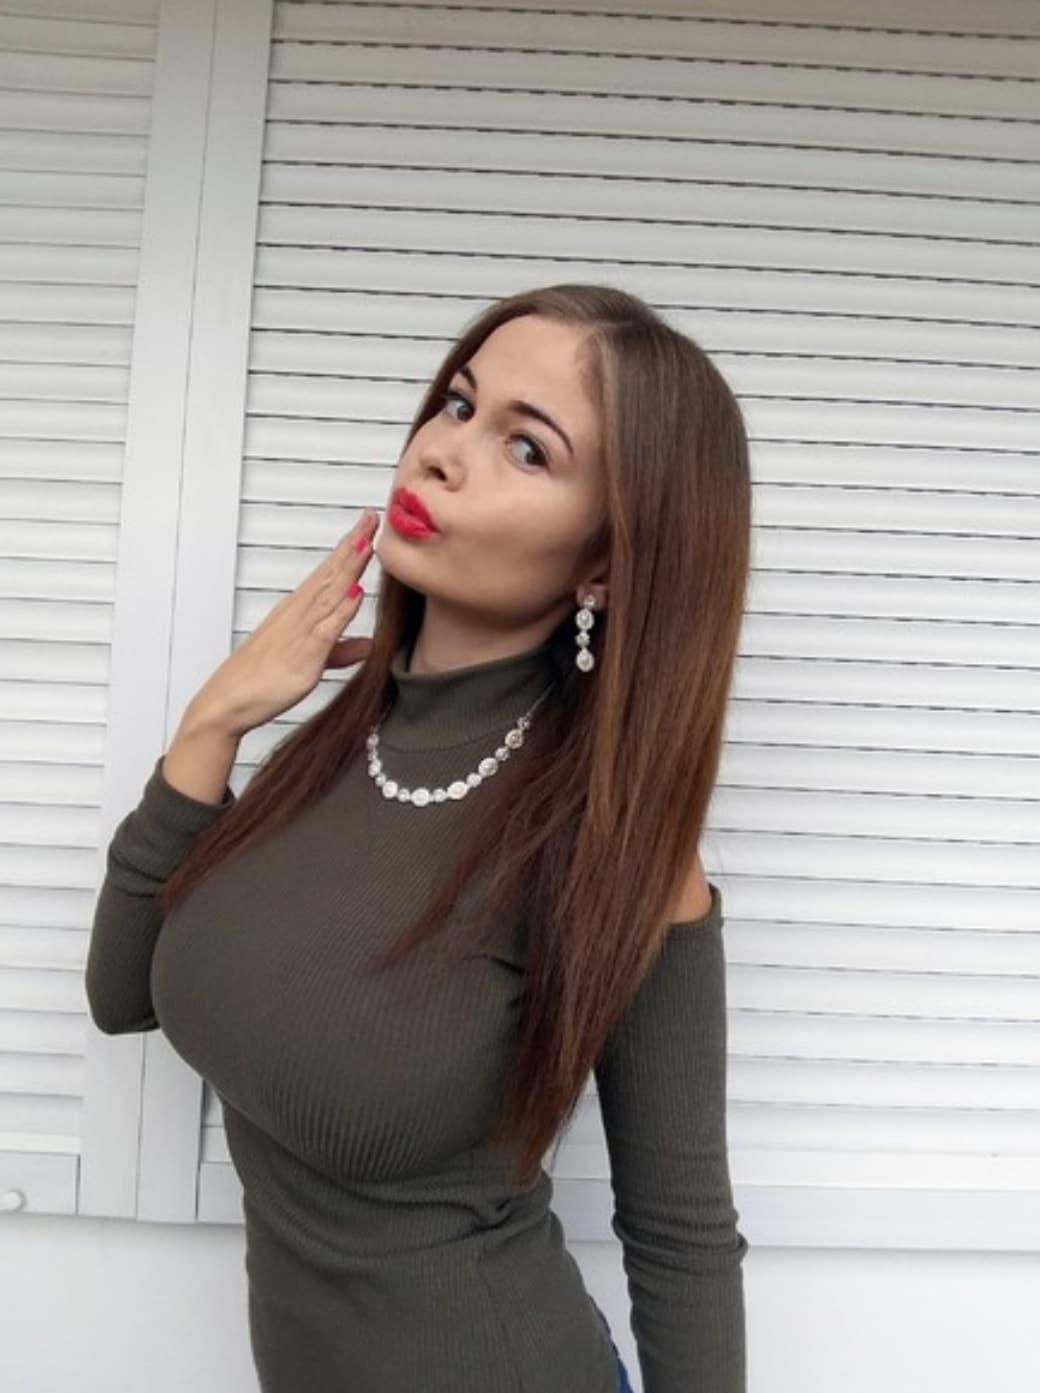 LeonieKaiser